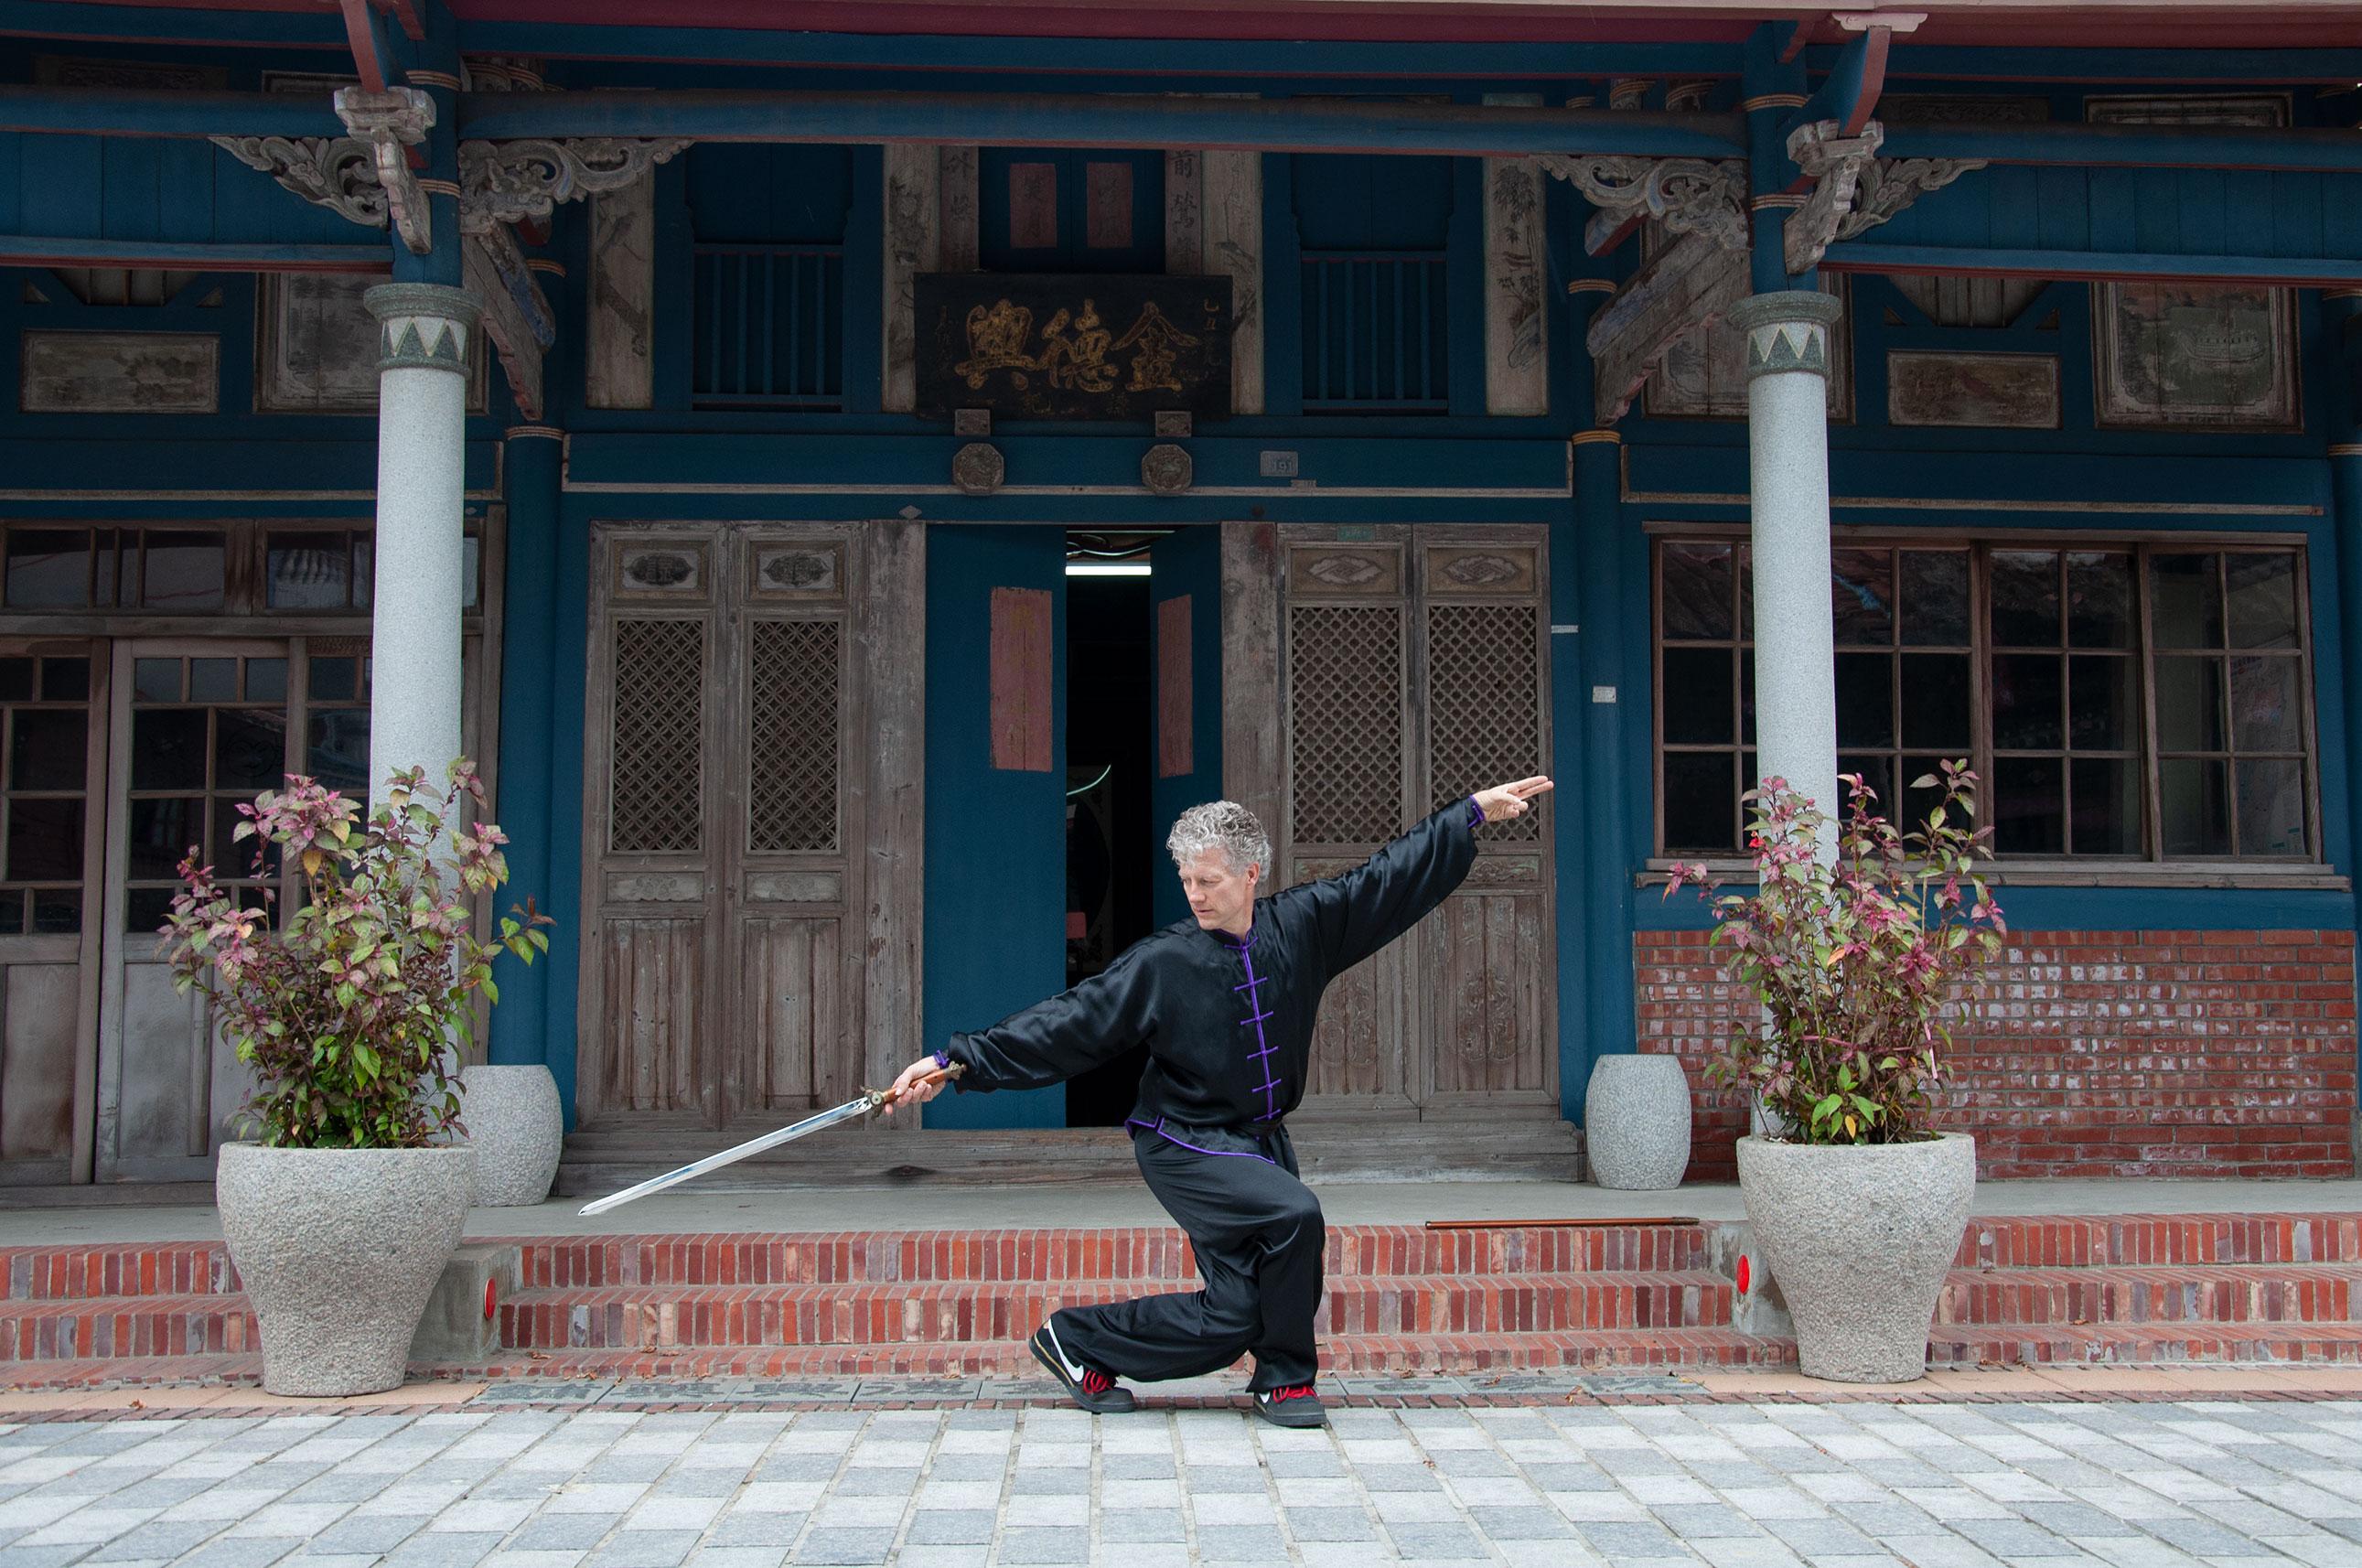 Sword form performed by Sifu Jensen, teacher of 10,000 victories school in San Rafael, Marin, CA.